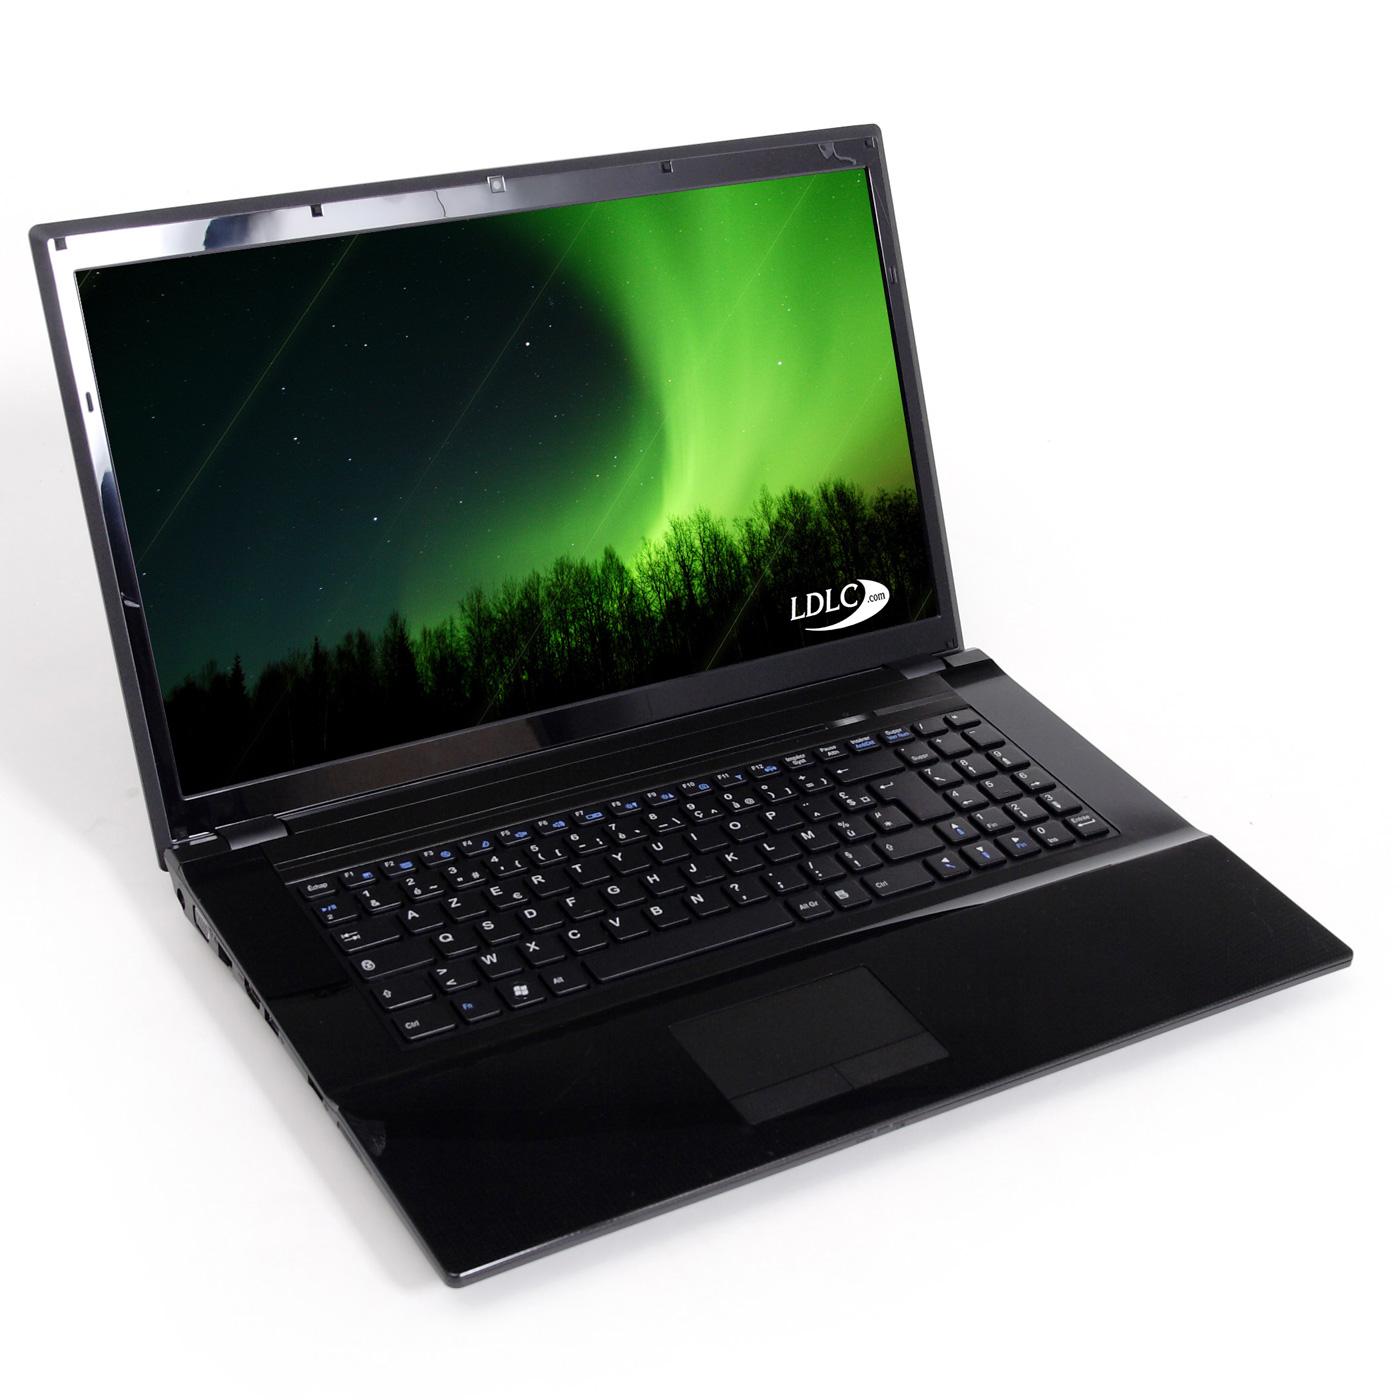 "PC portable LDLC Aurore BG1-I5-8-H5 Intel Core i5-2430M 8 Go 500 Go 17.3"" LED Graveur DVD Wi-Fi N/Bluetooth Webcam (sans OS)"